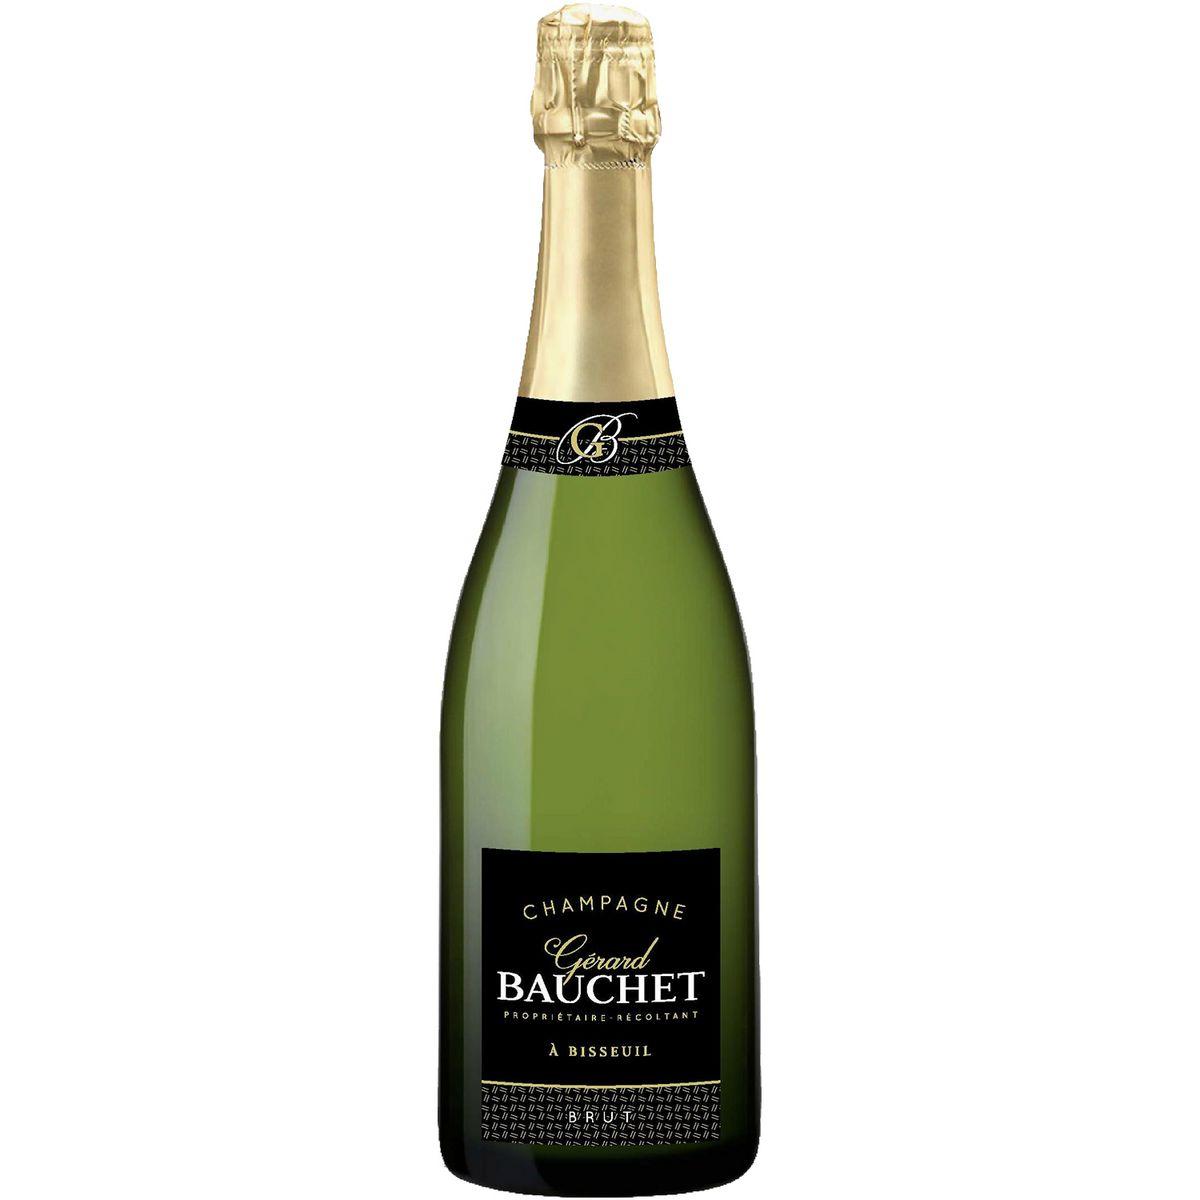 Champagne Gerard Bauchet brut